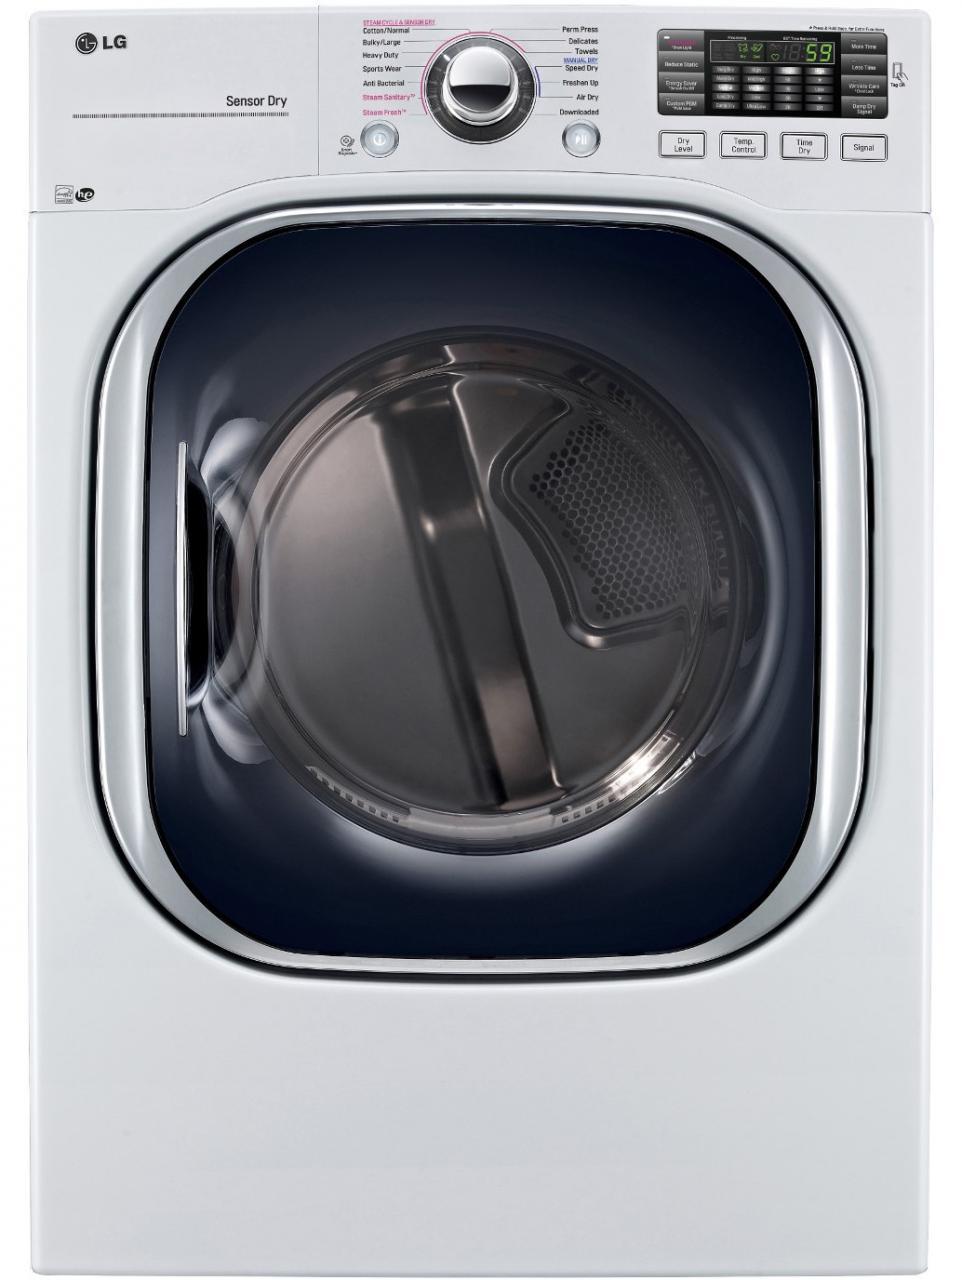 Gas Dryer Venting Options Fumtc Lg Dlex9000v Mega Capacity Smart Appliancejunkcom Whirlpool Diagram Also Sometimes Find